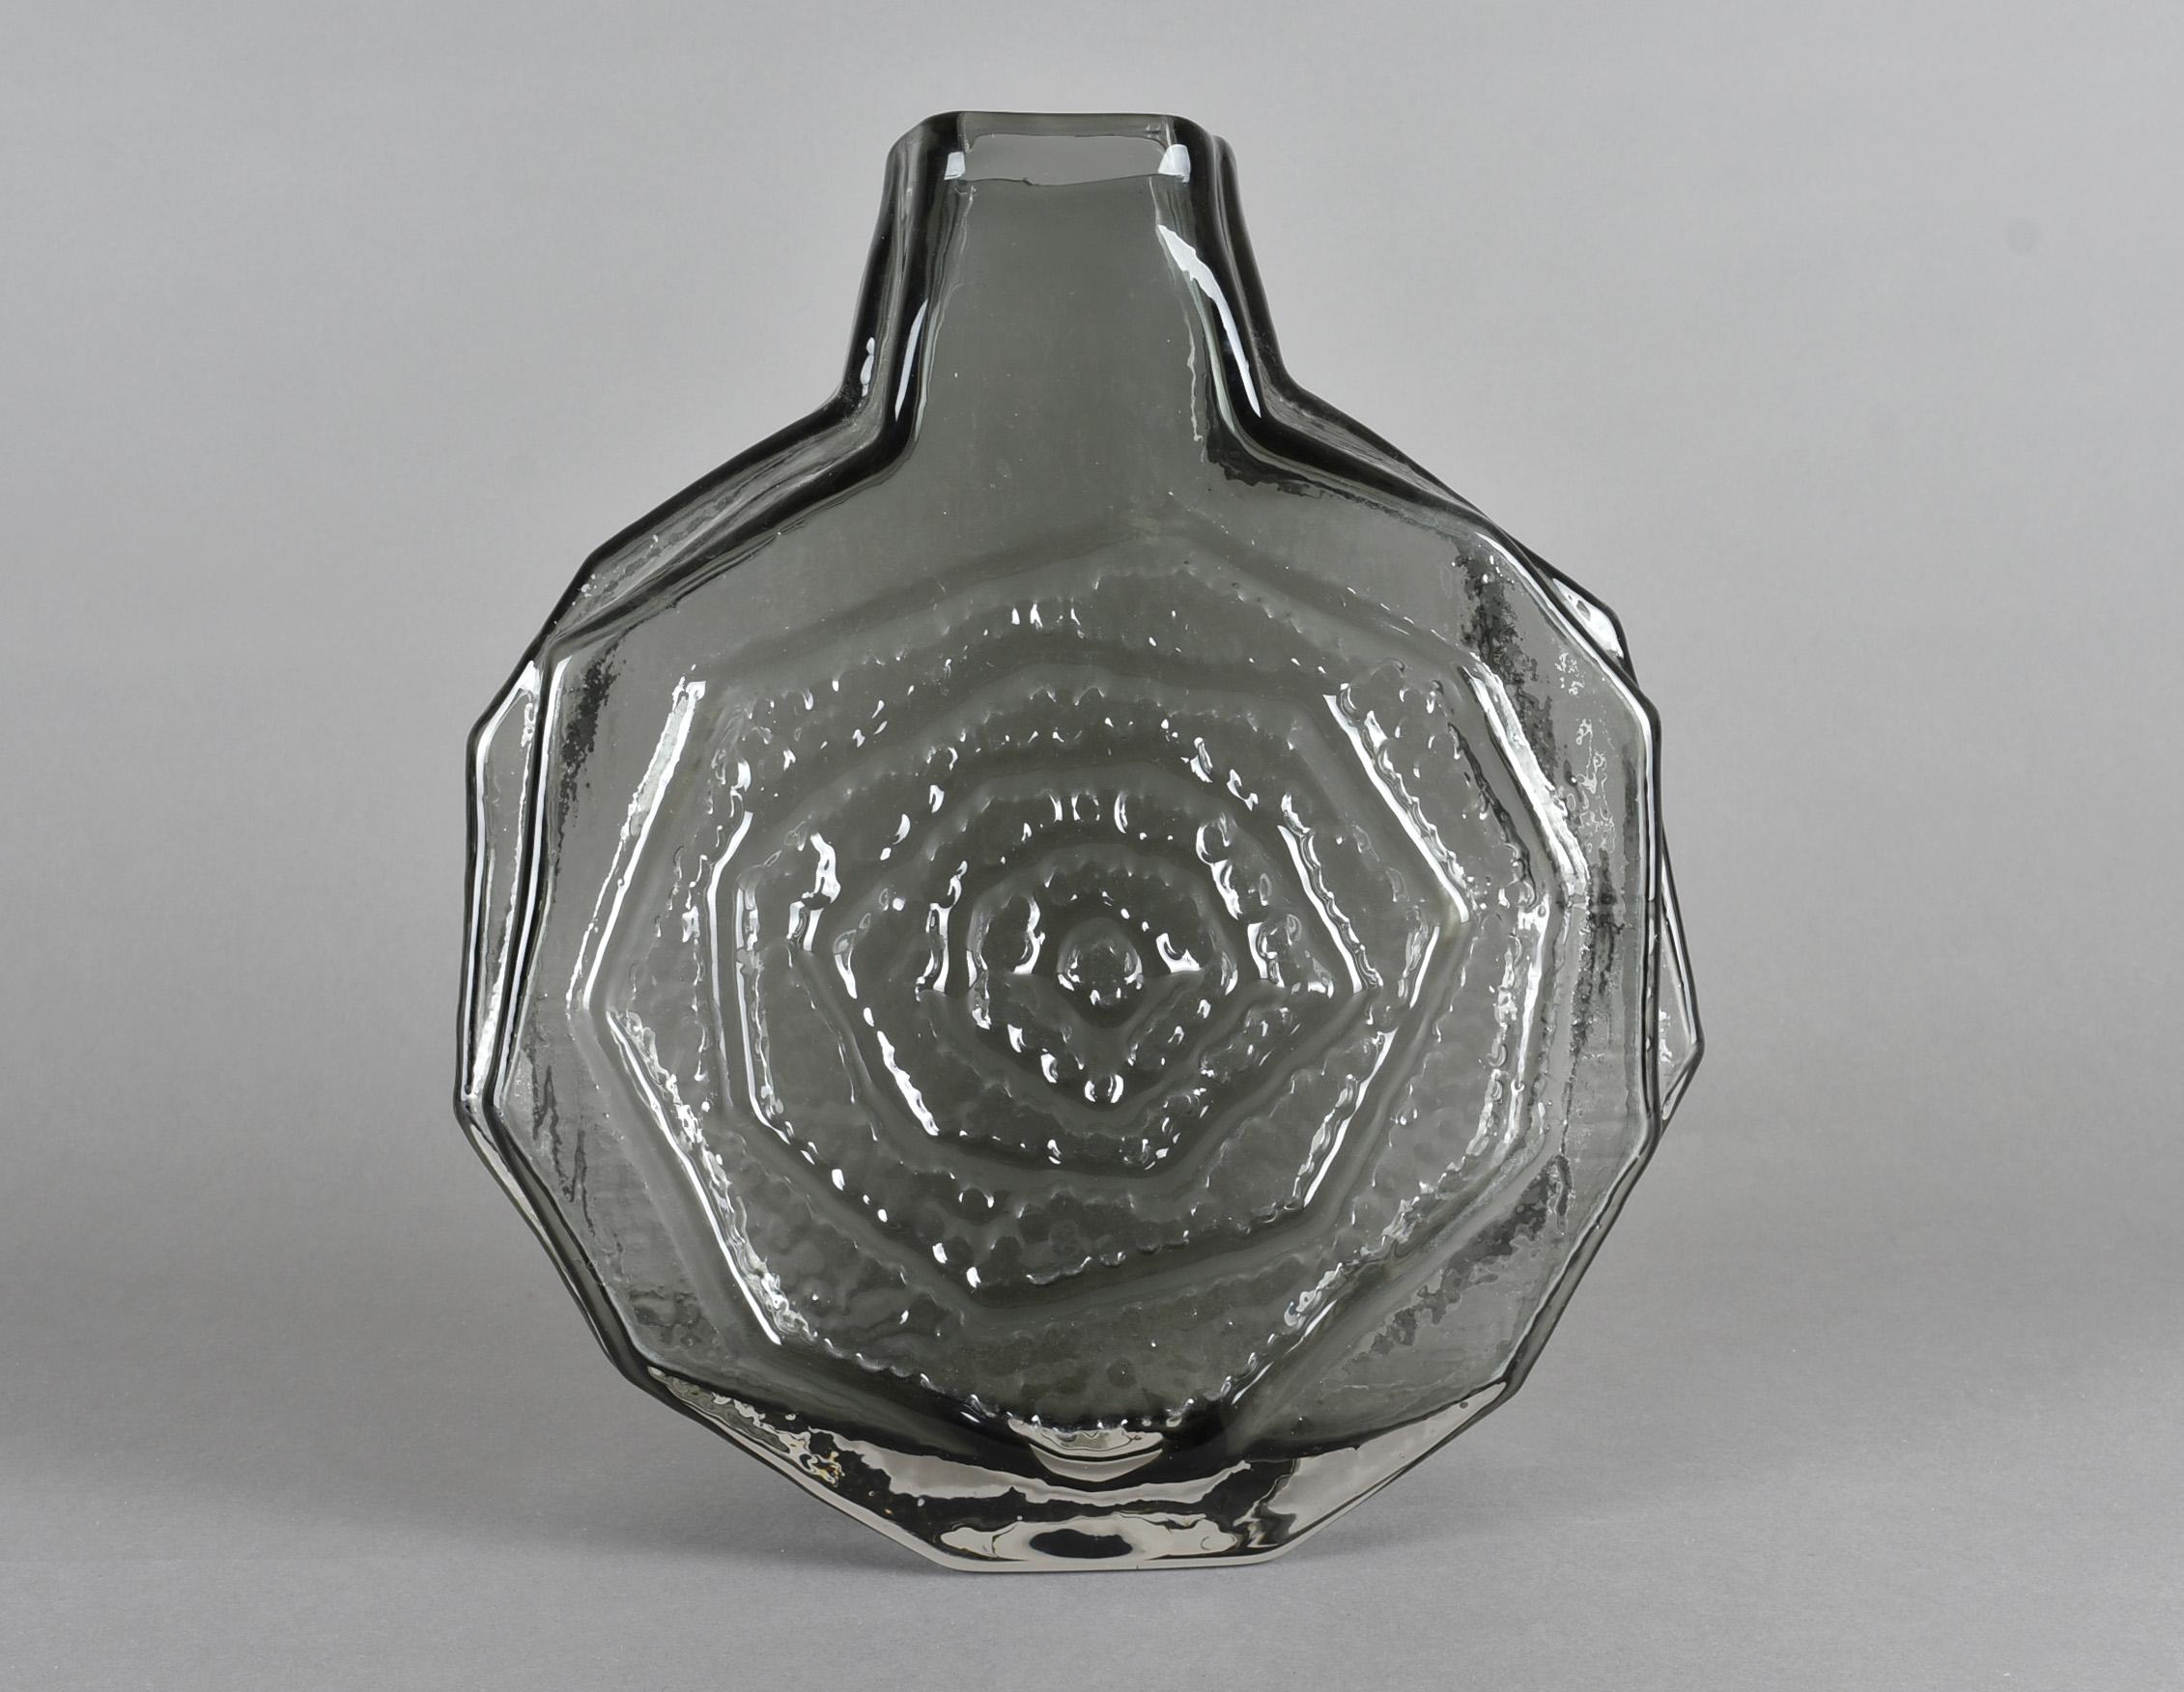 Geoffrey Baxter for Whitefriars, a Textured glass range 'Banjo' vase pattern 9681 in Pewter, 30 cm